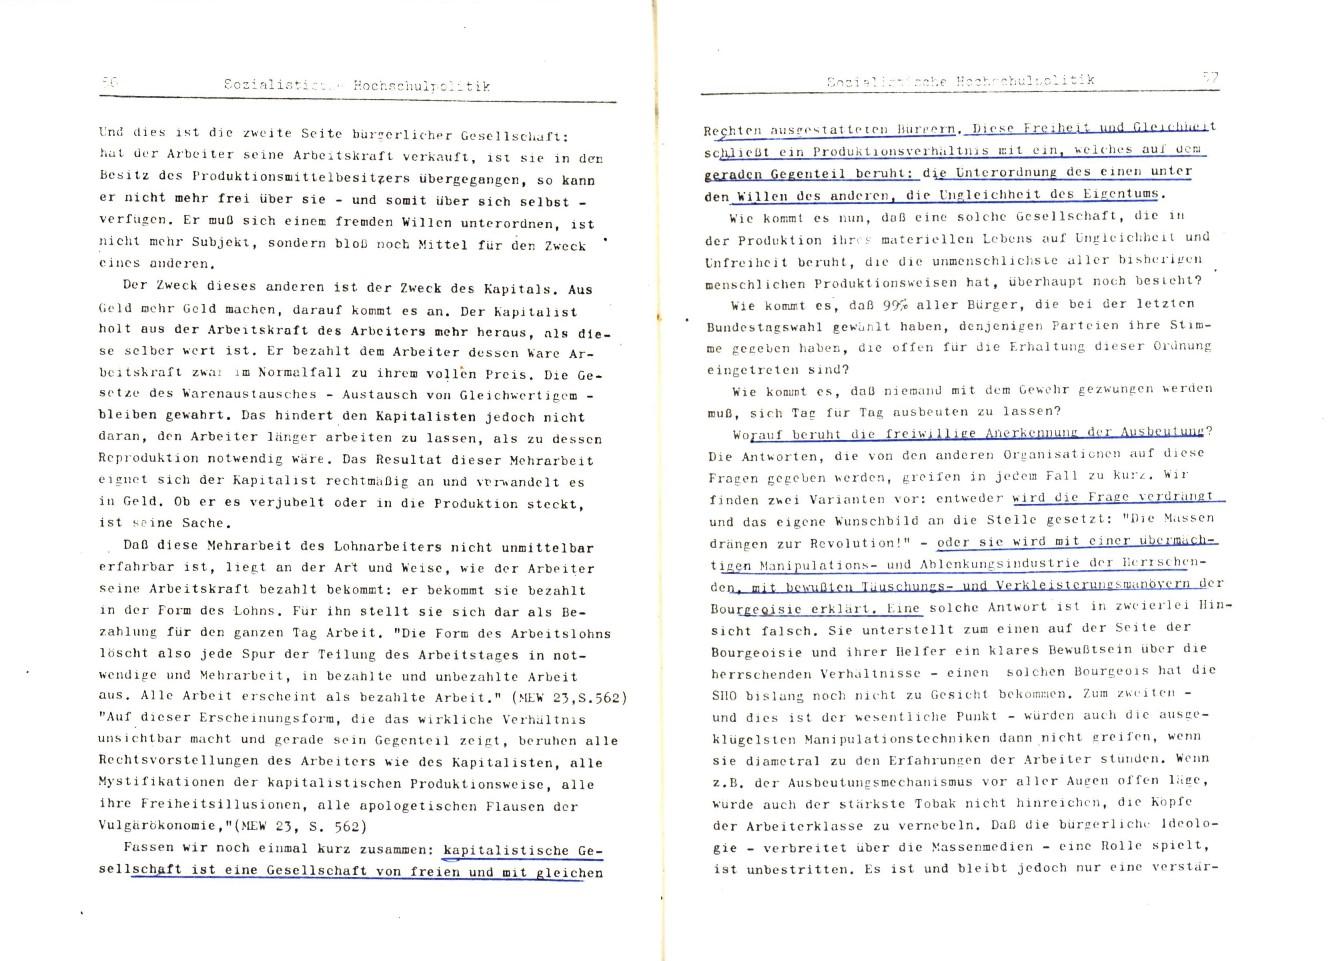 Muenster_SHO_1977_Studenteninteressen_29